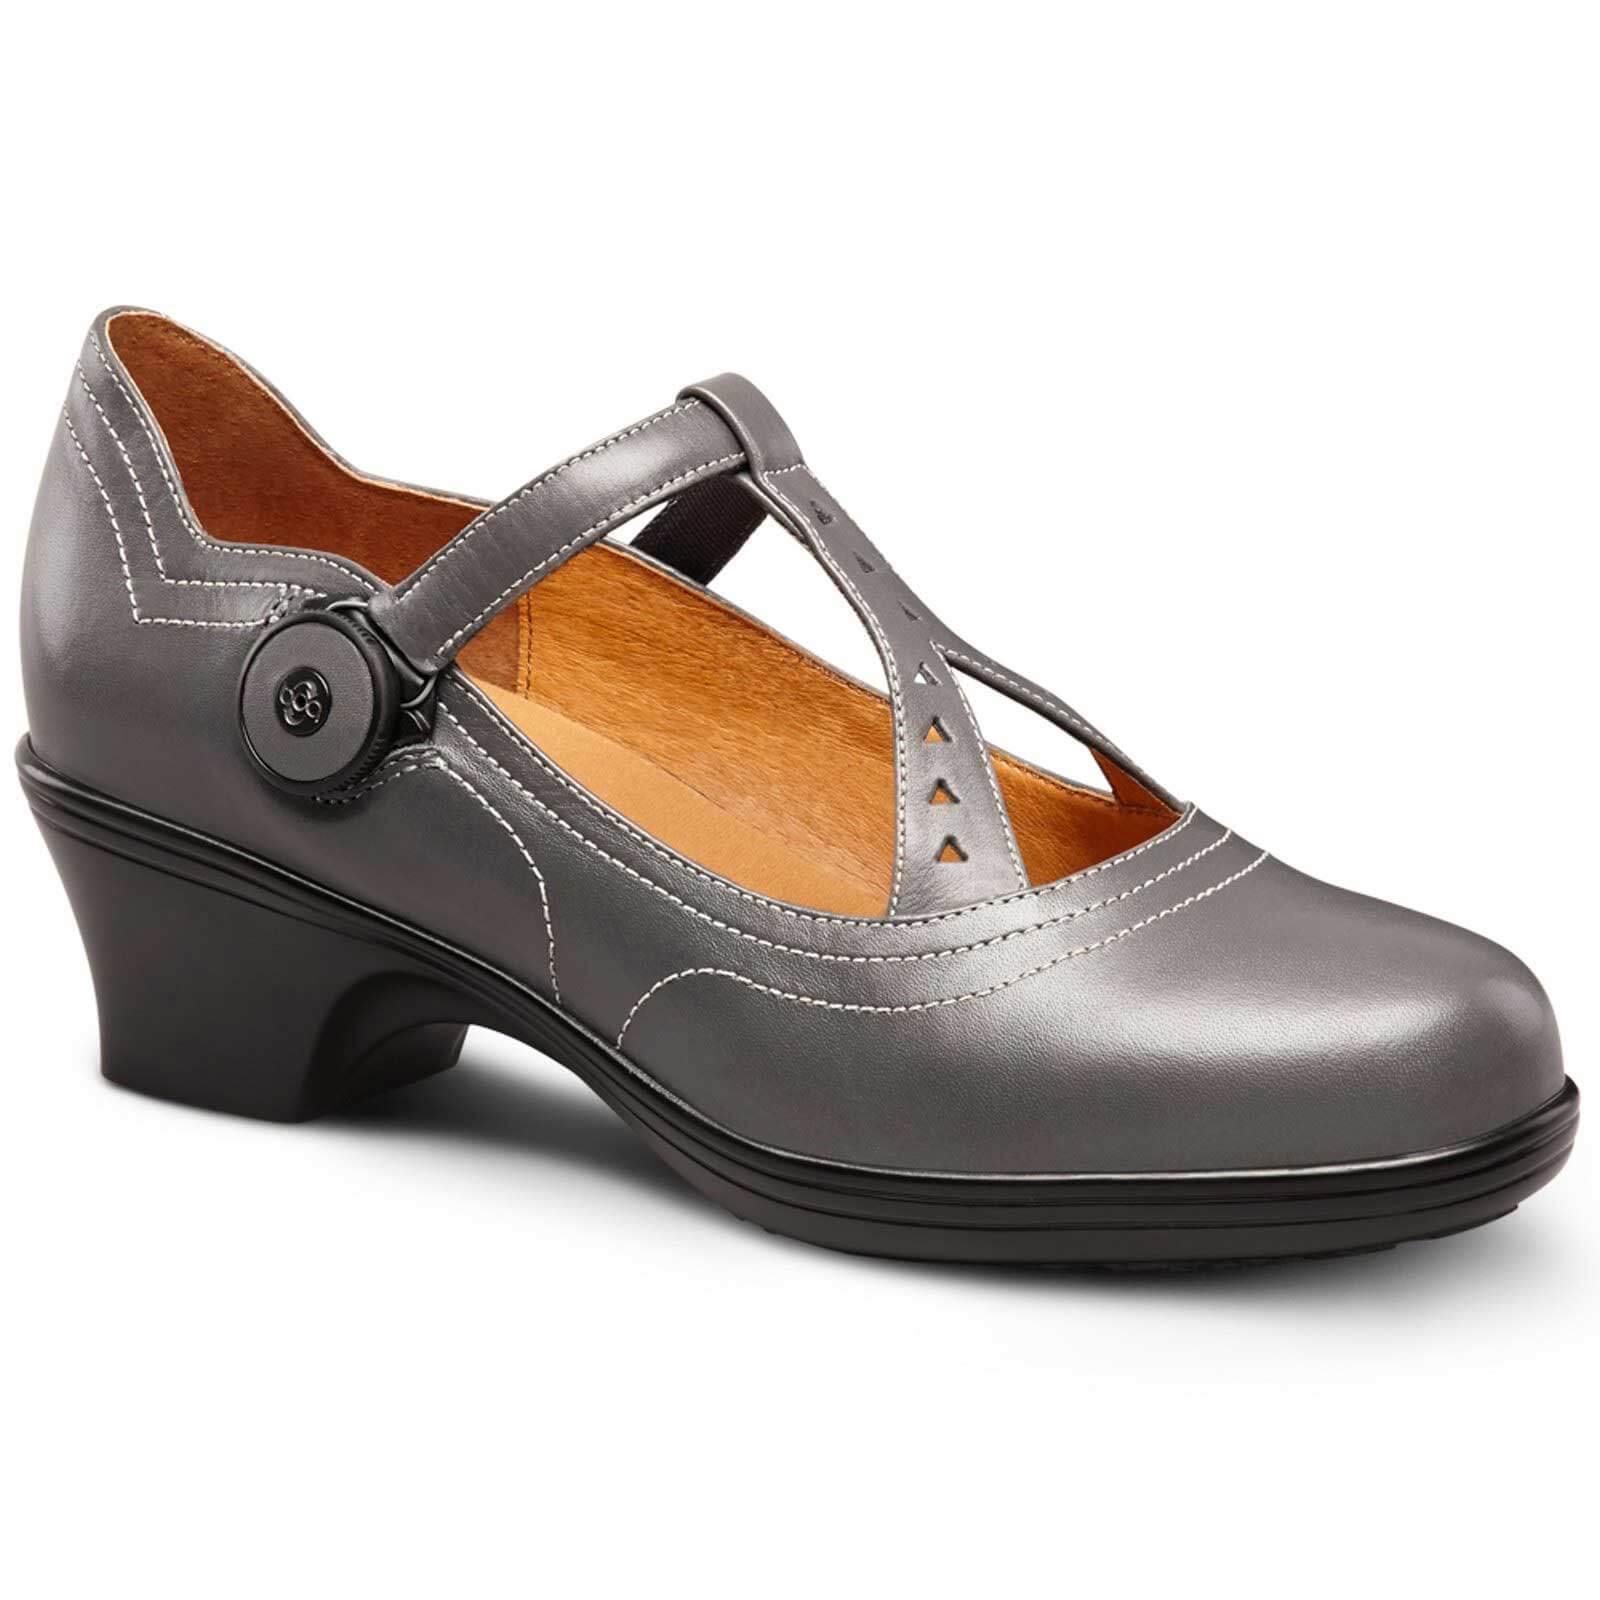 Fashionable Shoes For Diabetics